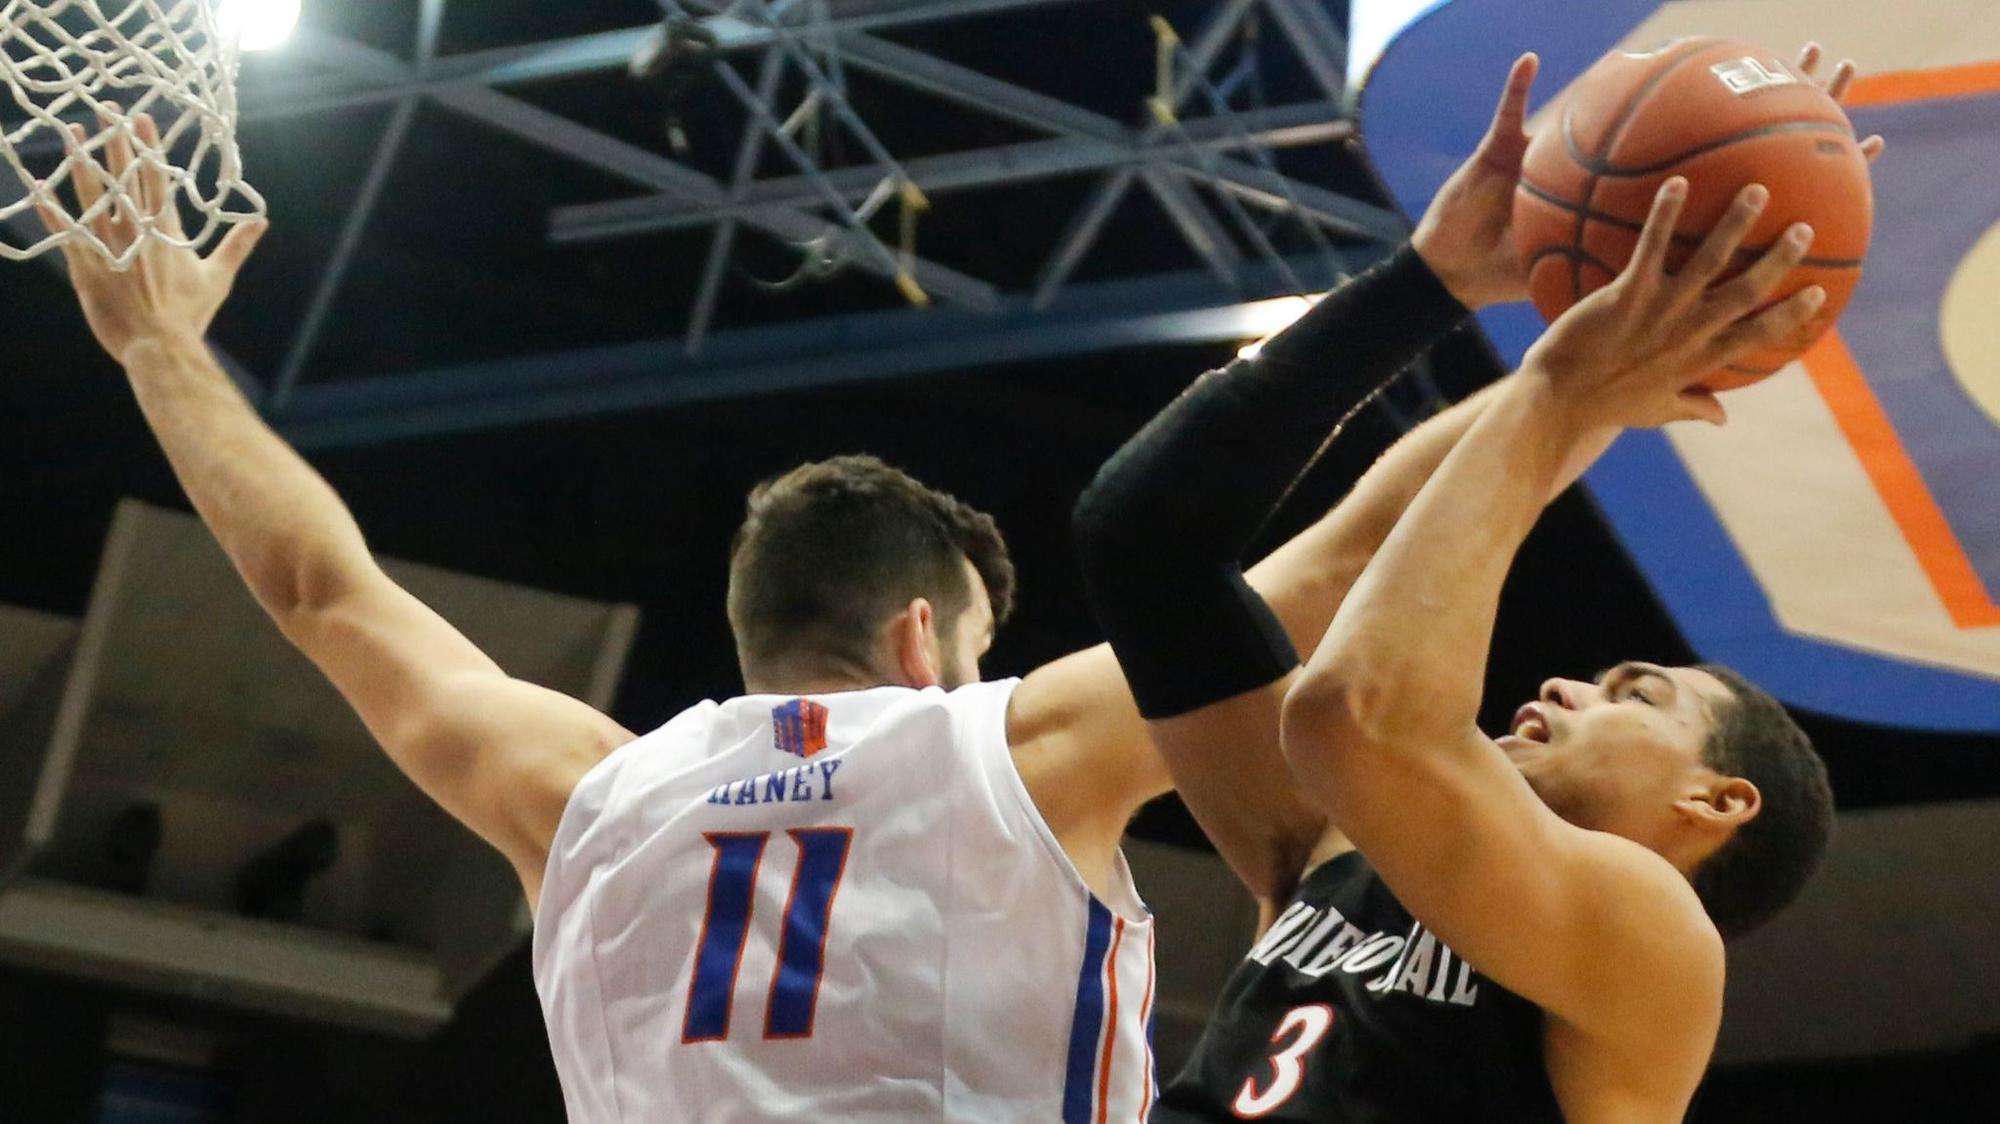 Sd-sp-sdsu-basketball-boise-state-taco-bell-20180112